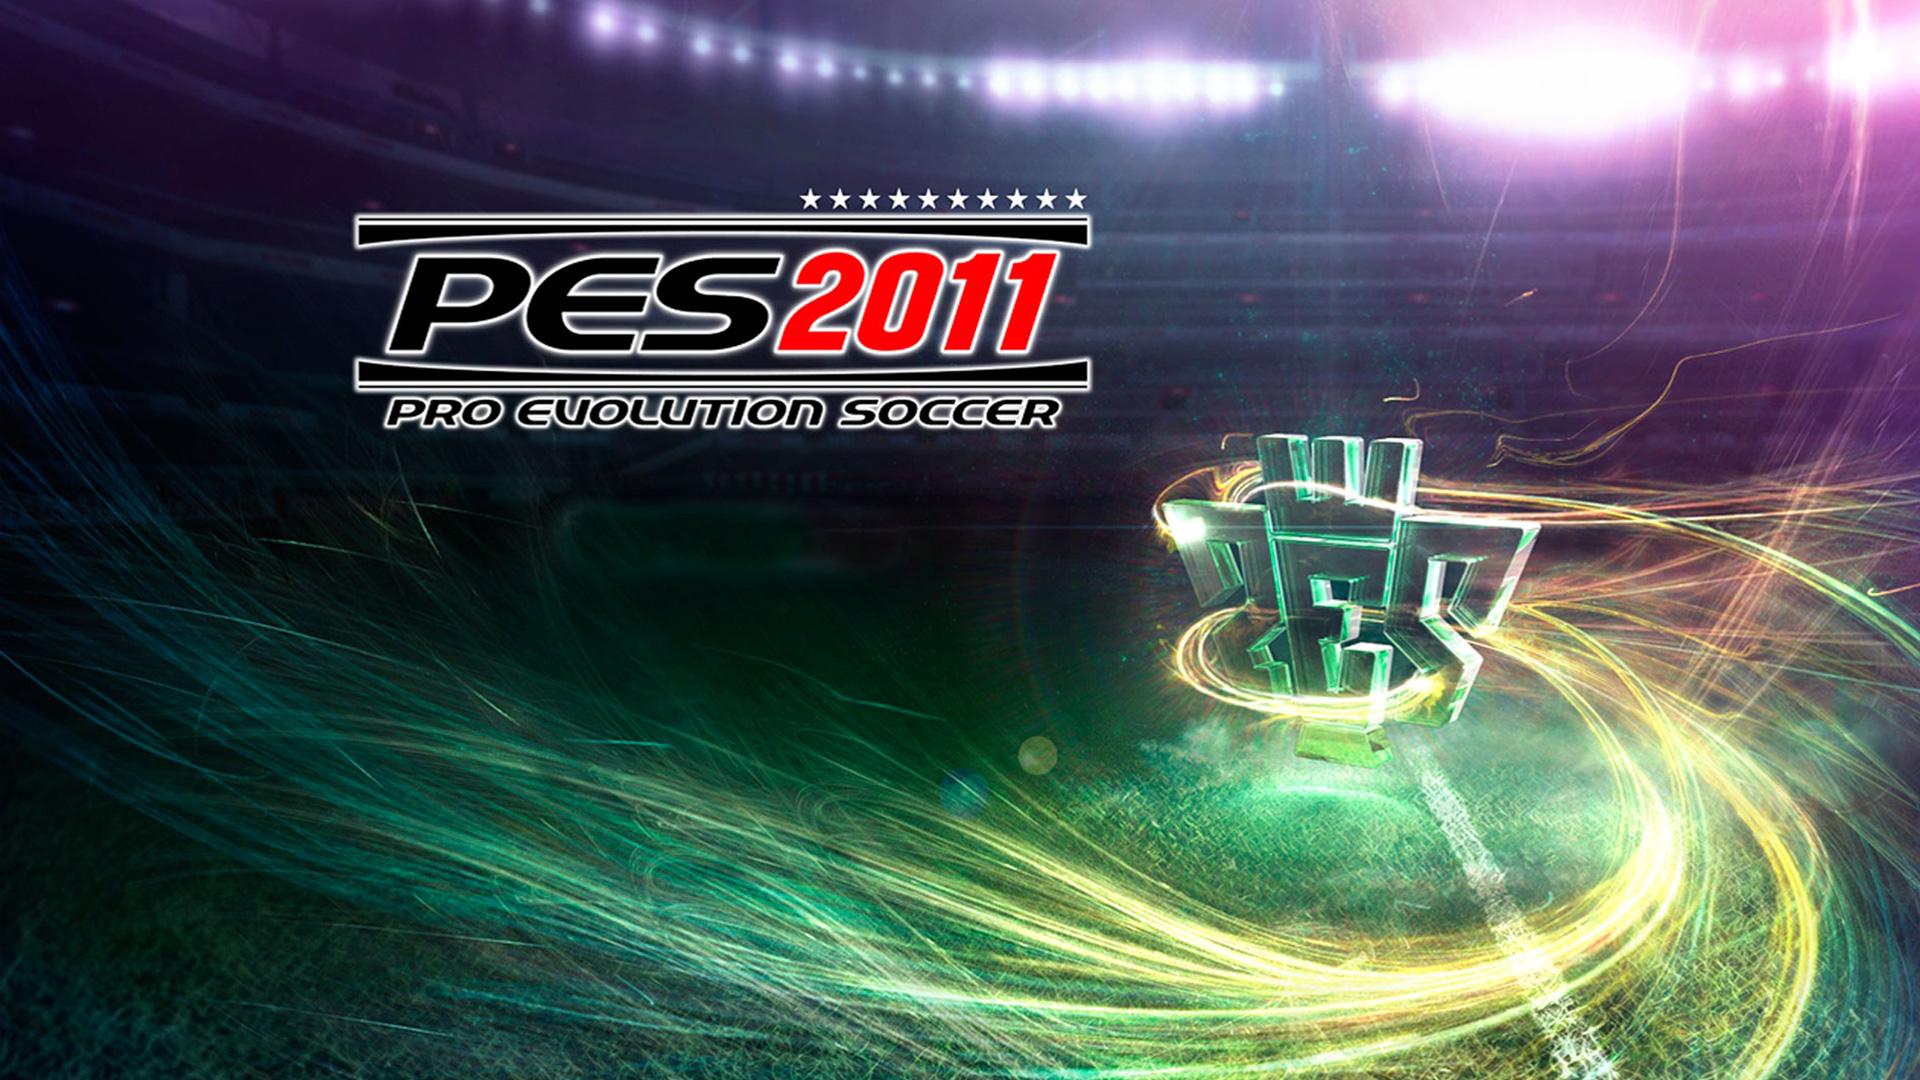 Pro Evolution Soccer 2011 Wallpaper in 1920x1080